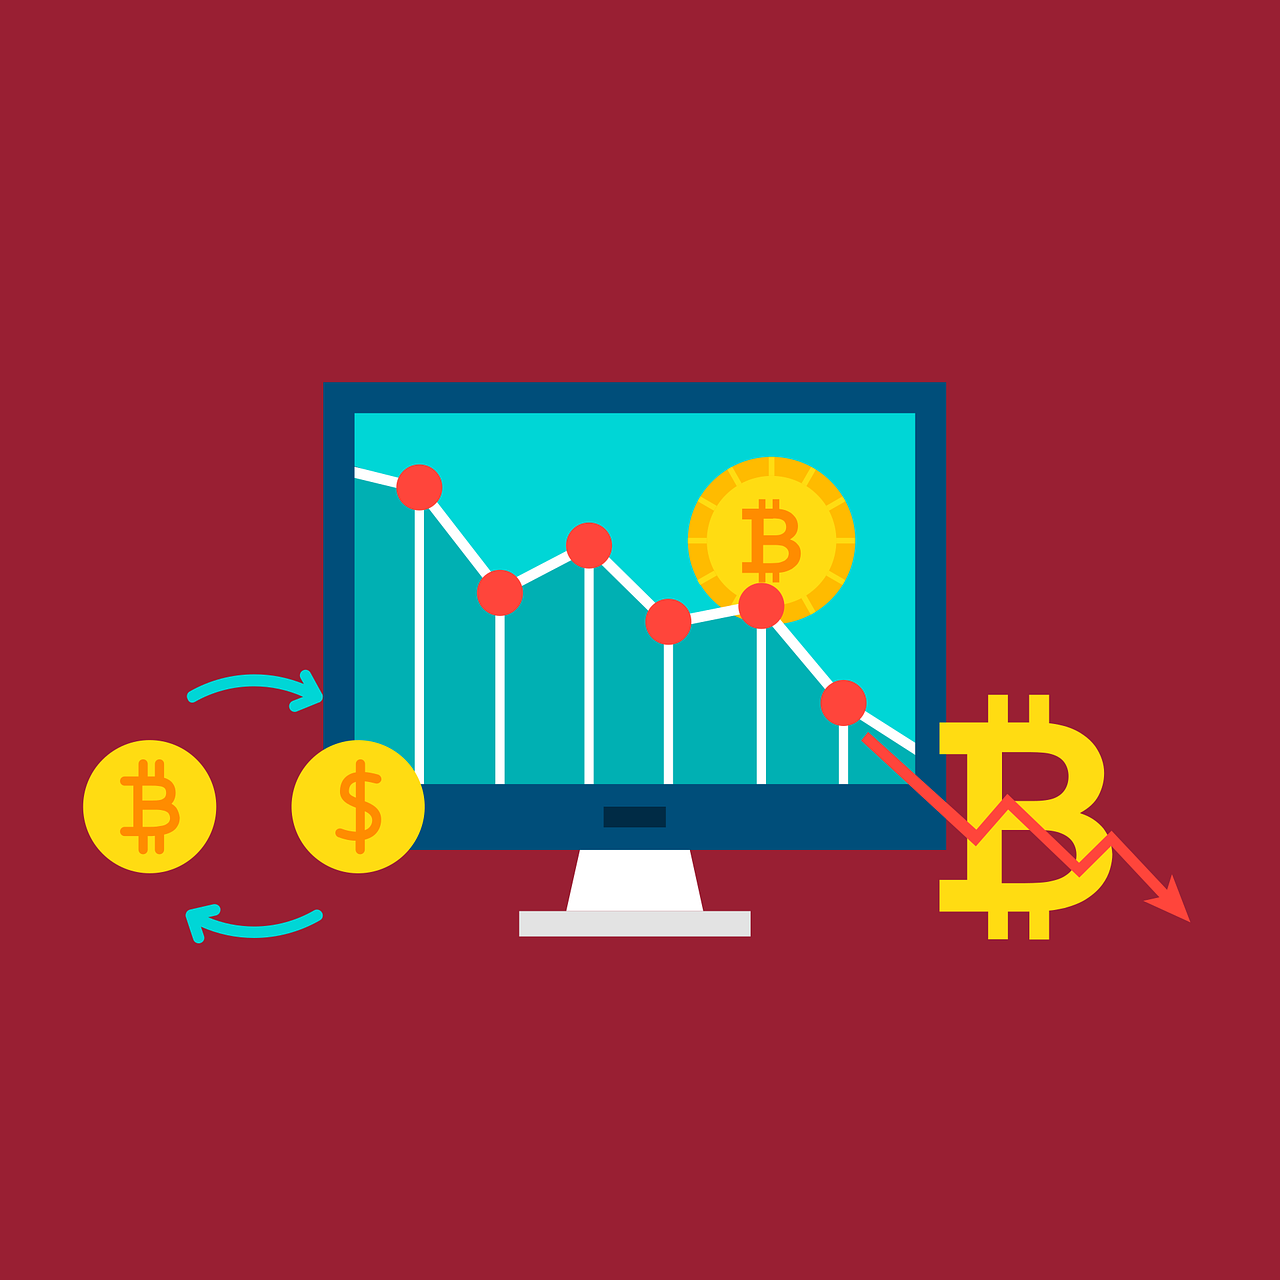 Analysis of Bitcoin Prime: Legit or Scam?